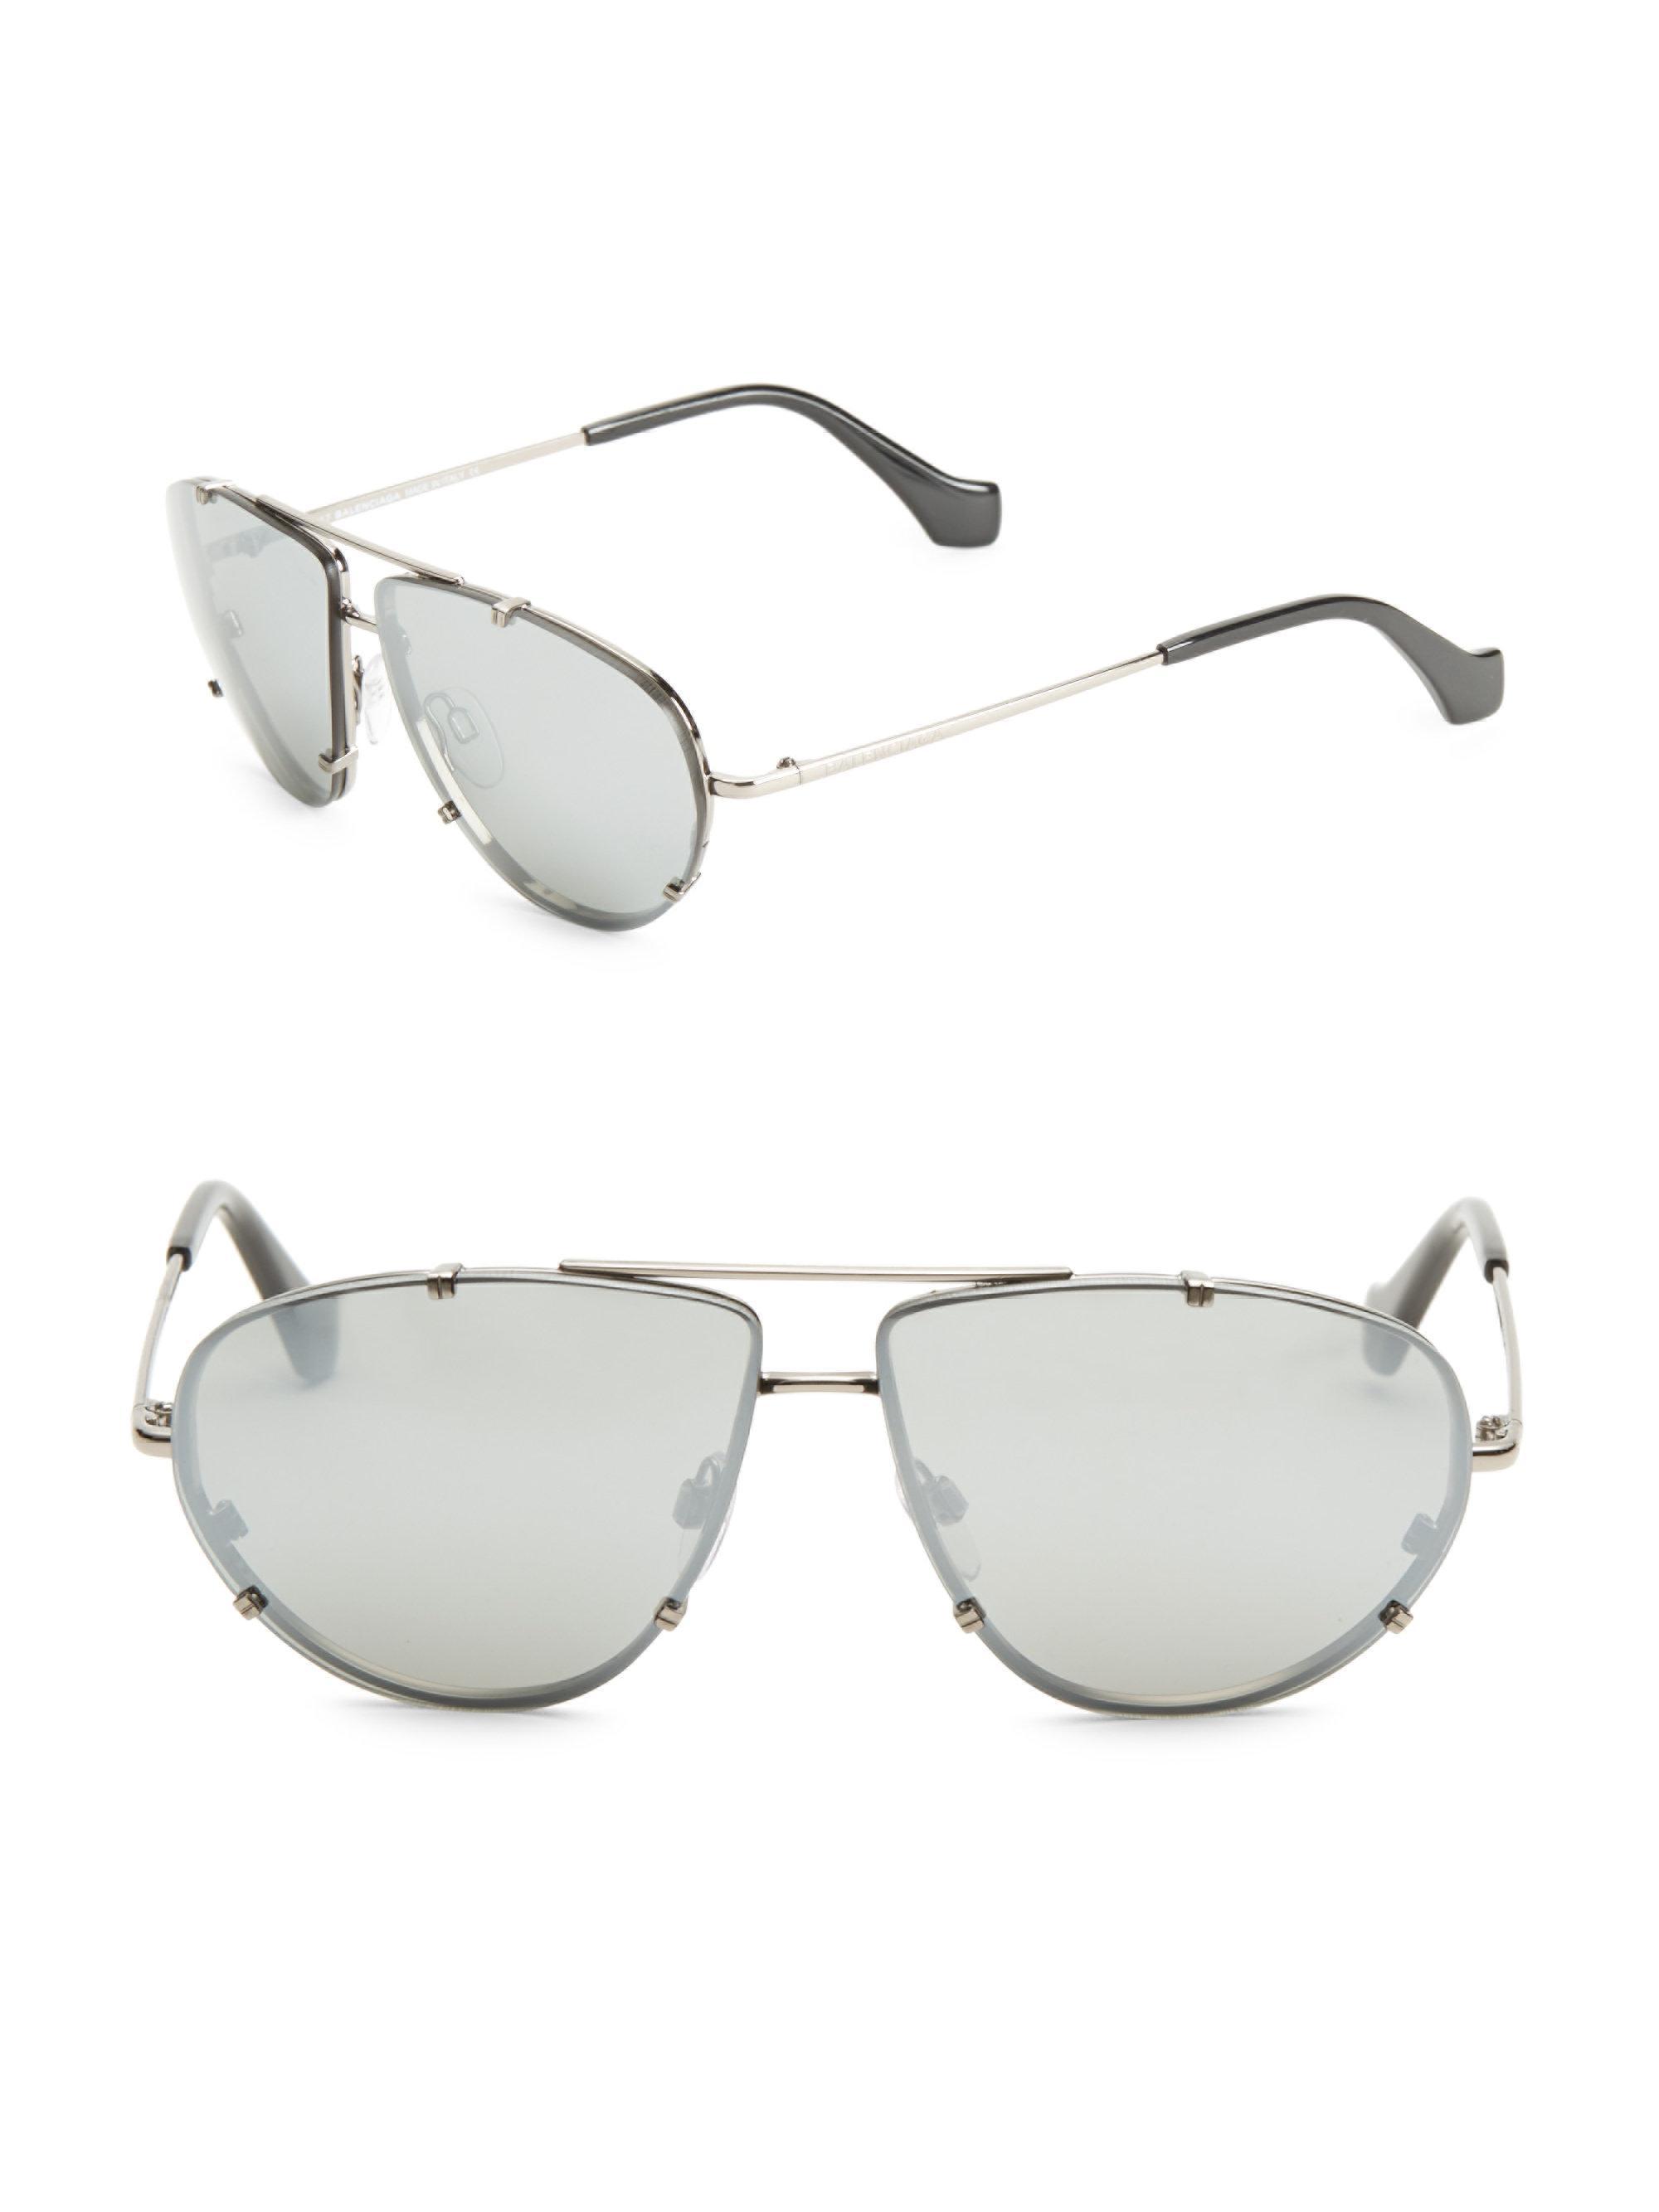 5f40ffe863d Balenciaga 62mm Mirrored Aviator Sunglasses in Metallic for Men - Lyst